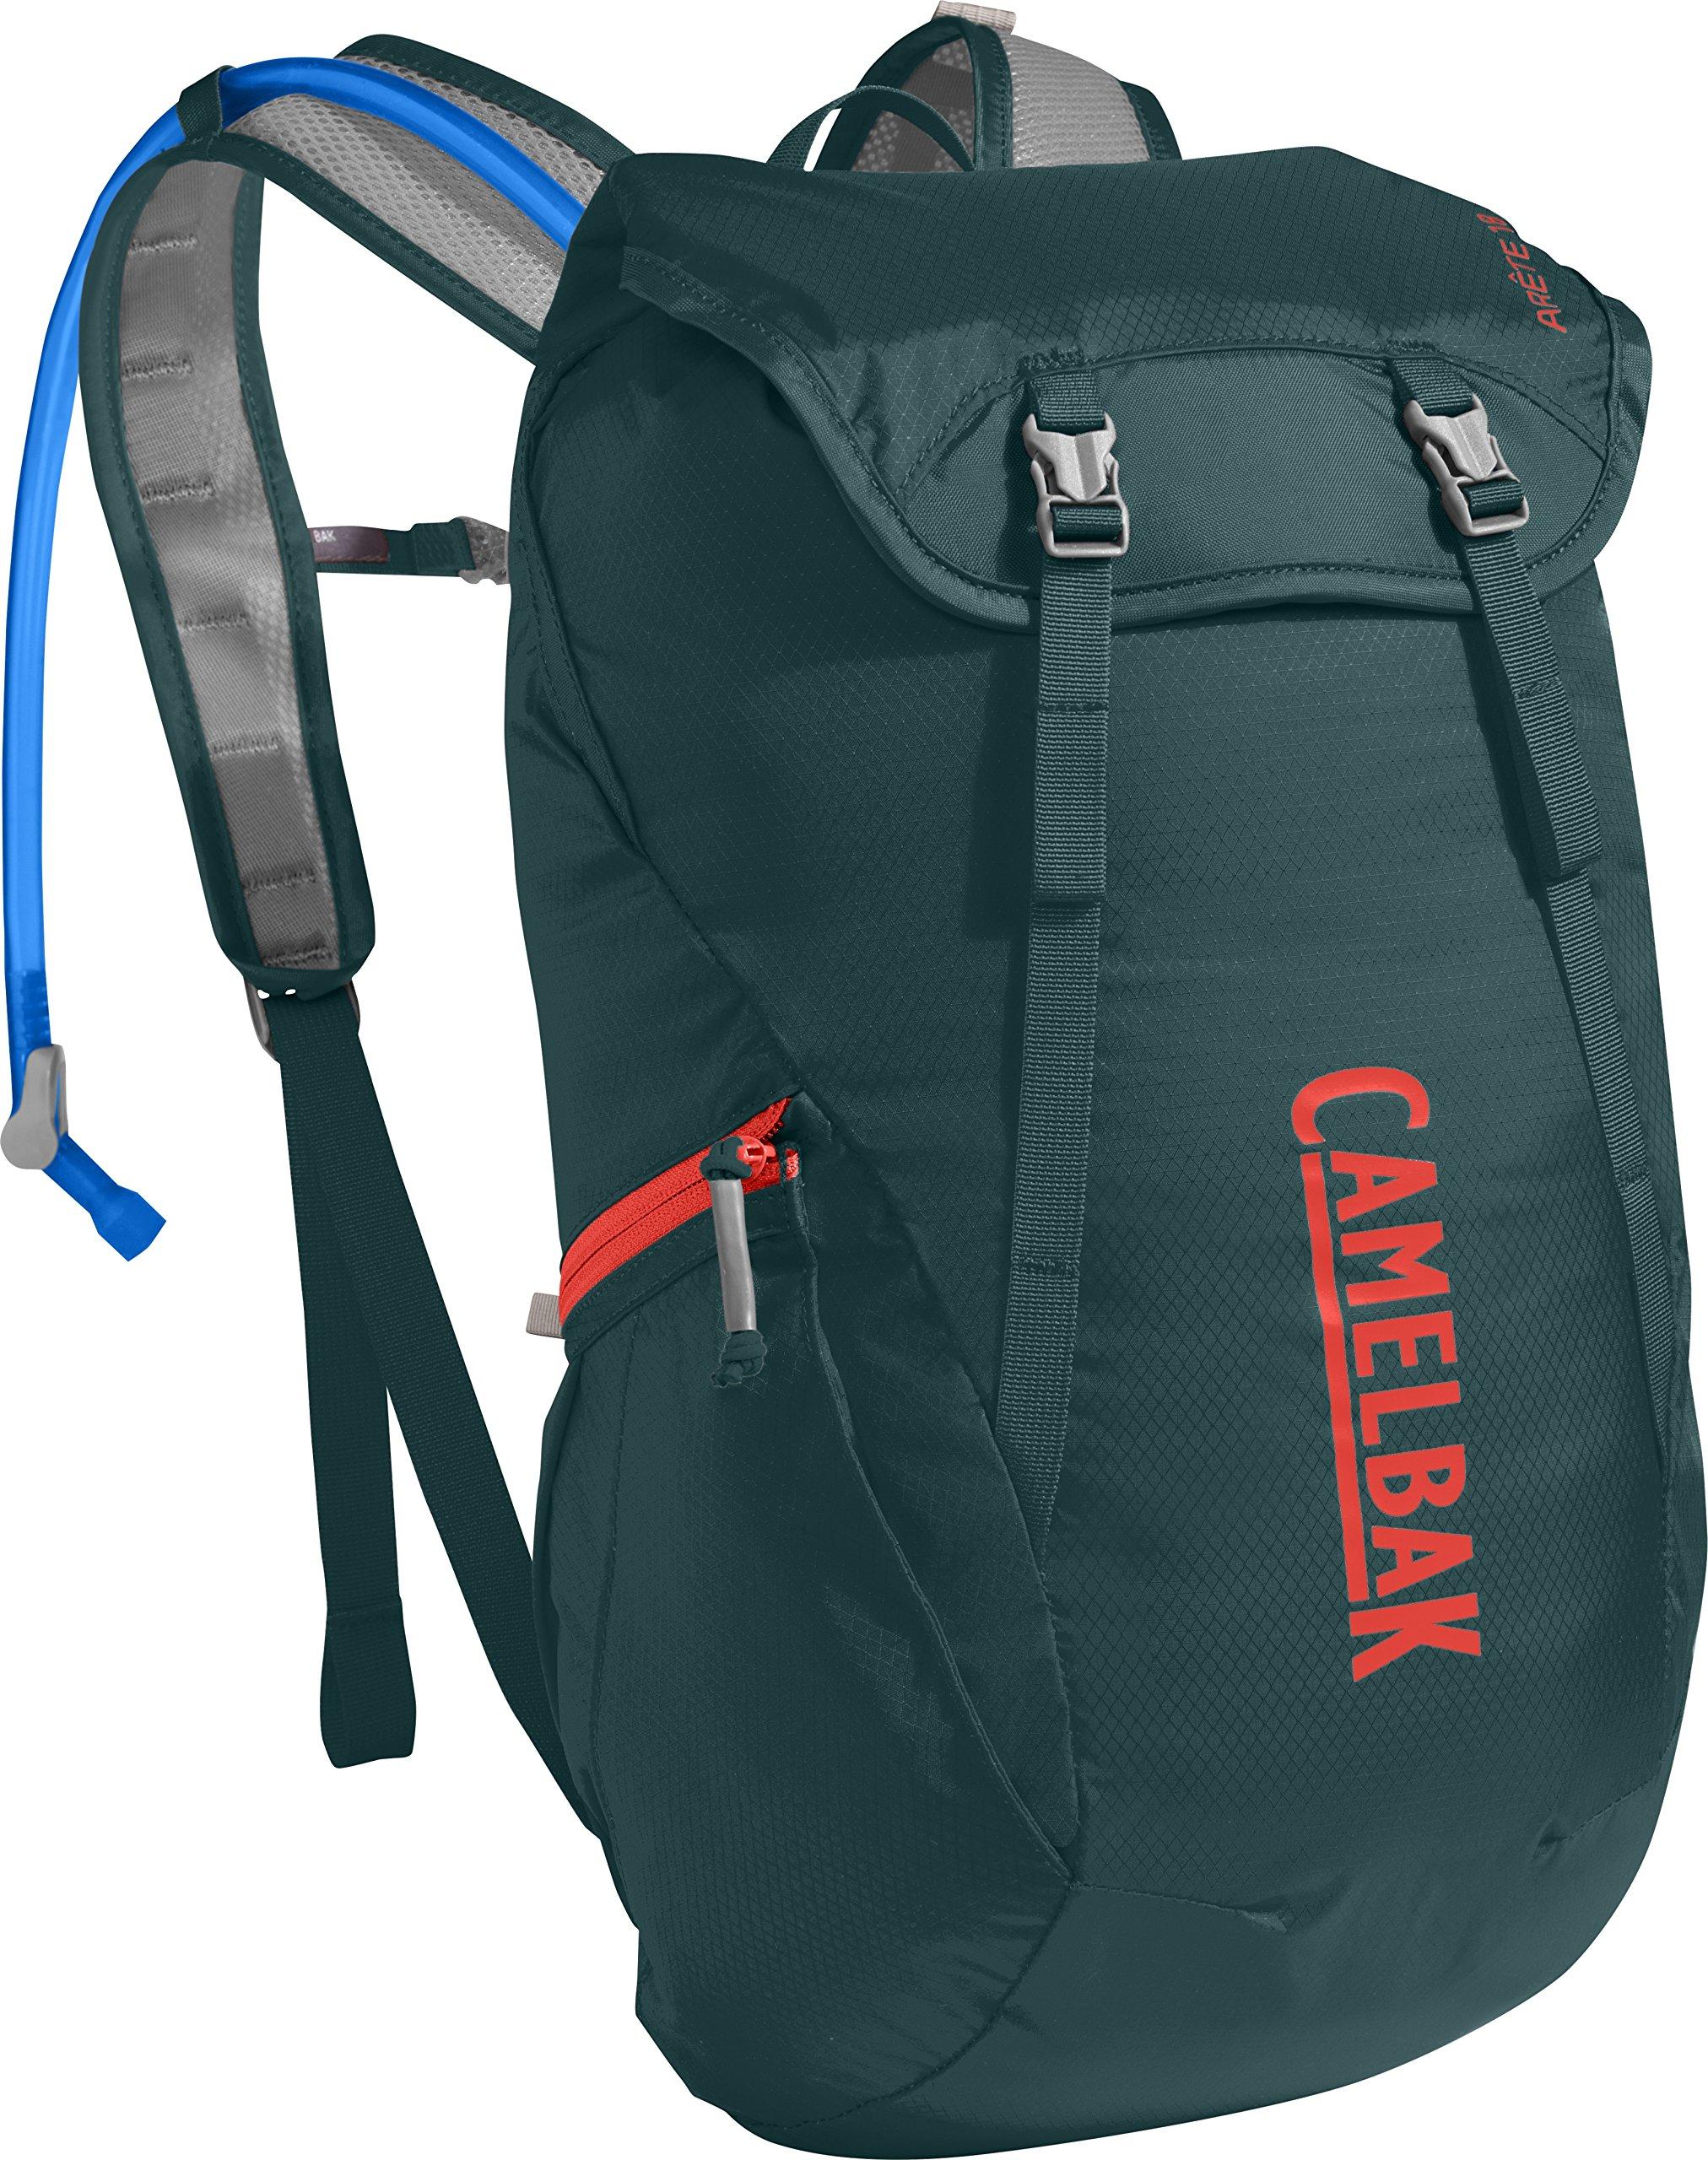 CamelBak Arete 18 Crux Reservoir Hydration Pack, Deep Teal/Hot Coral, 1.5 L/50 oz